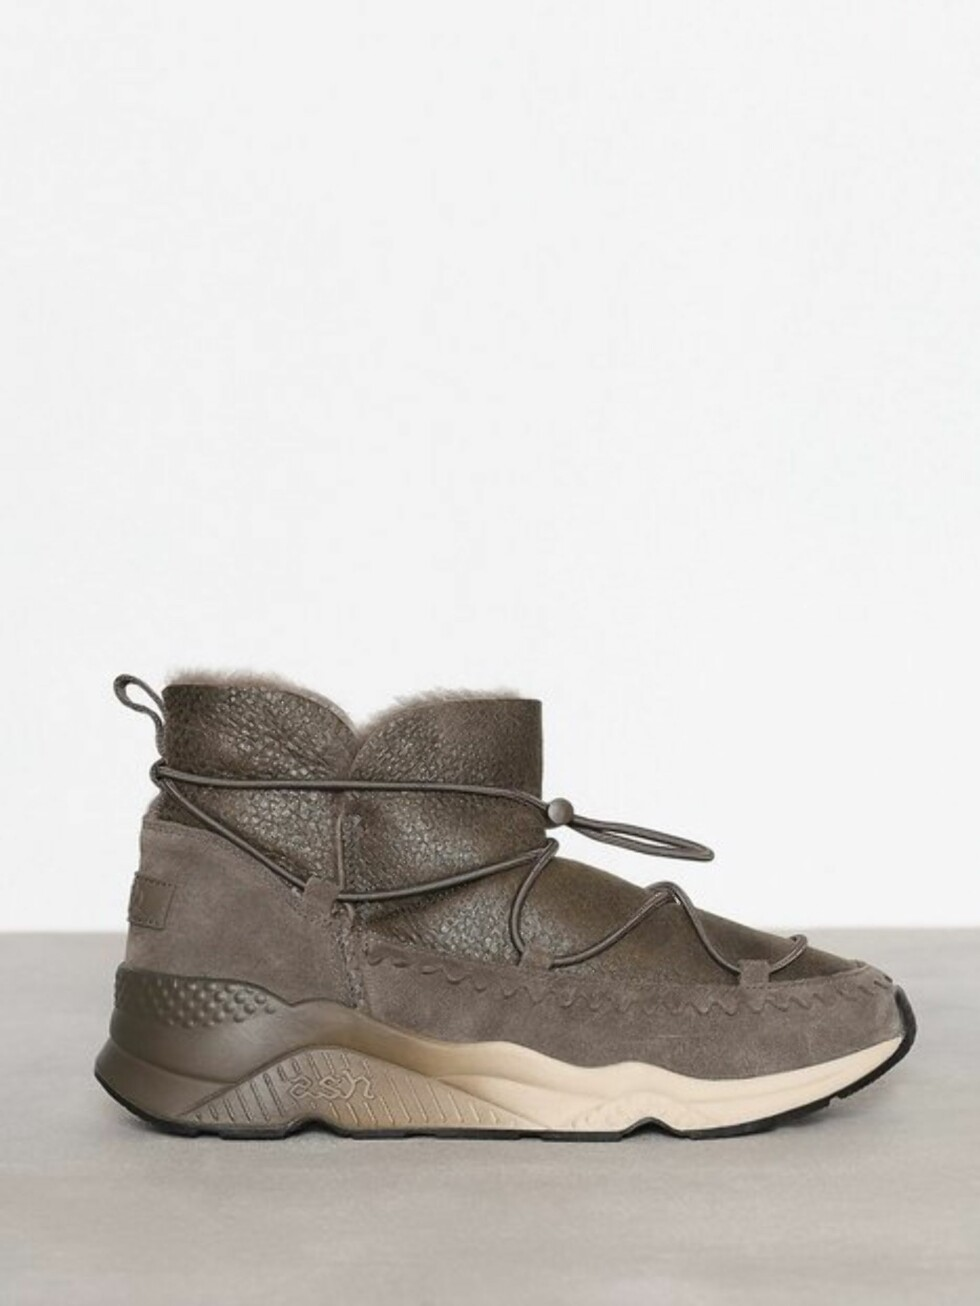 Sko fra Ash Italia via Nelly.com |1899,-| https://nelly.com/no/kl%C3%A6r-til-kvinner/sko/boots-booties/ash-italia-201329/mitsouko-135884-0388/